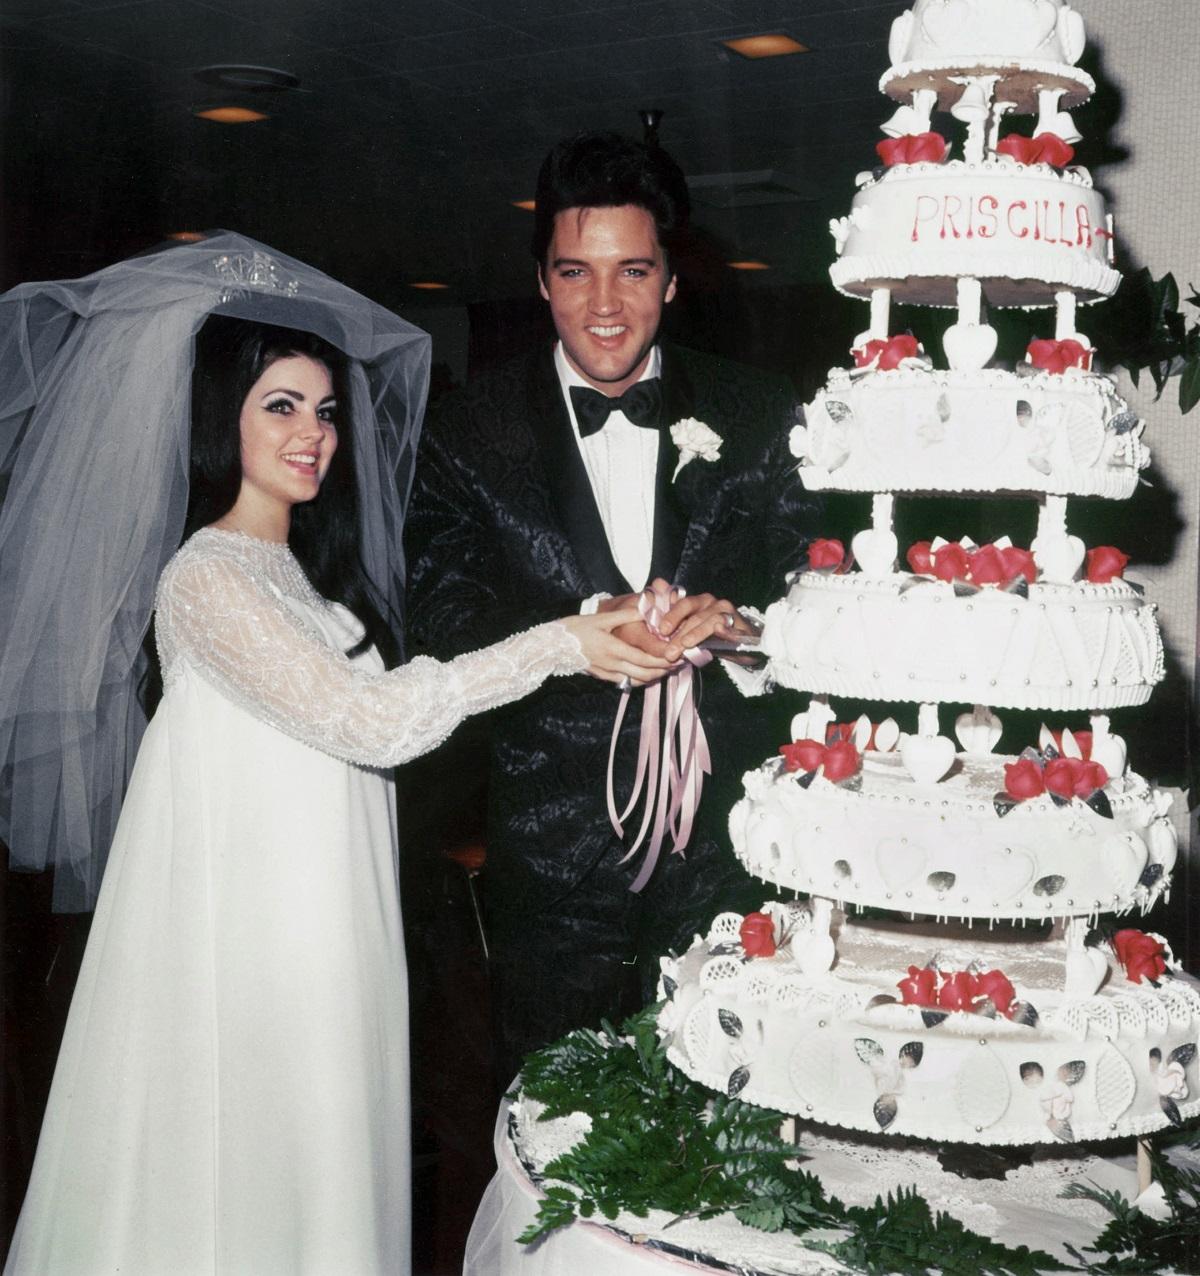 Elvis and Priscilla Presley at their wedding